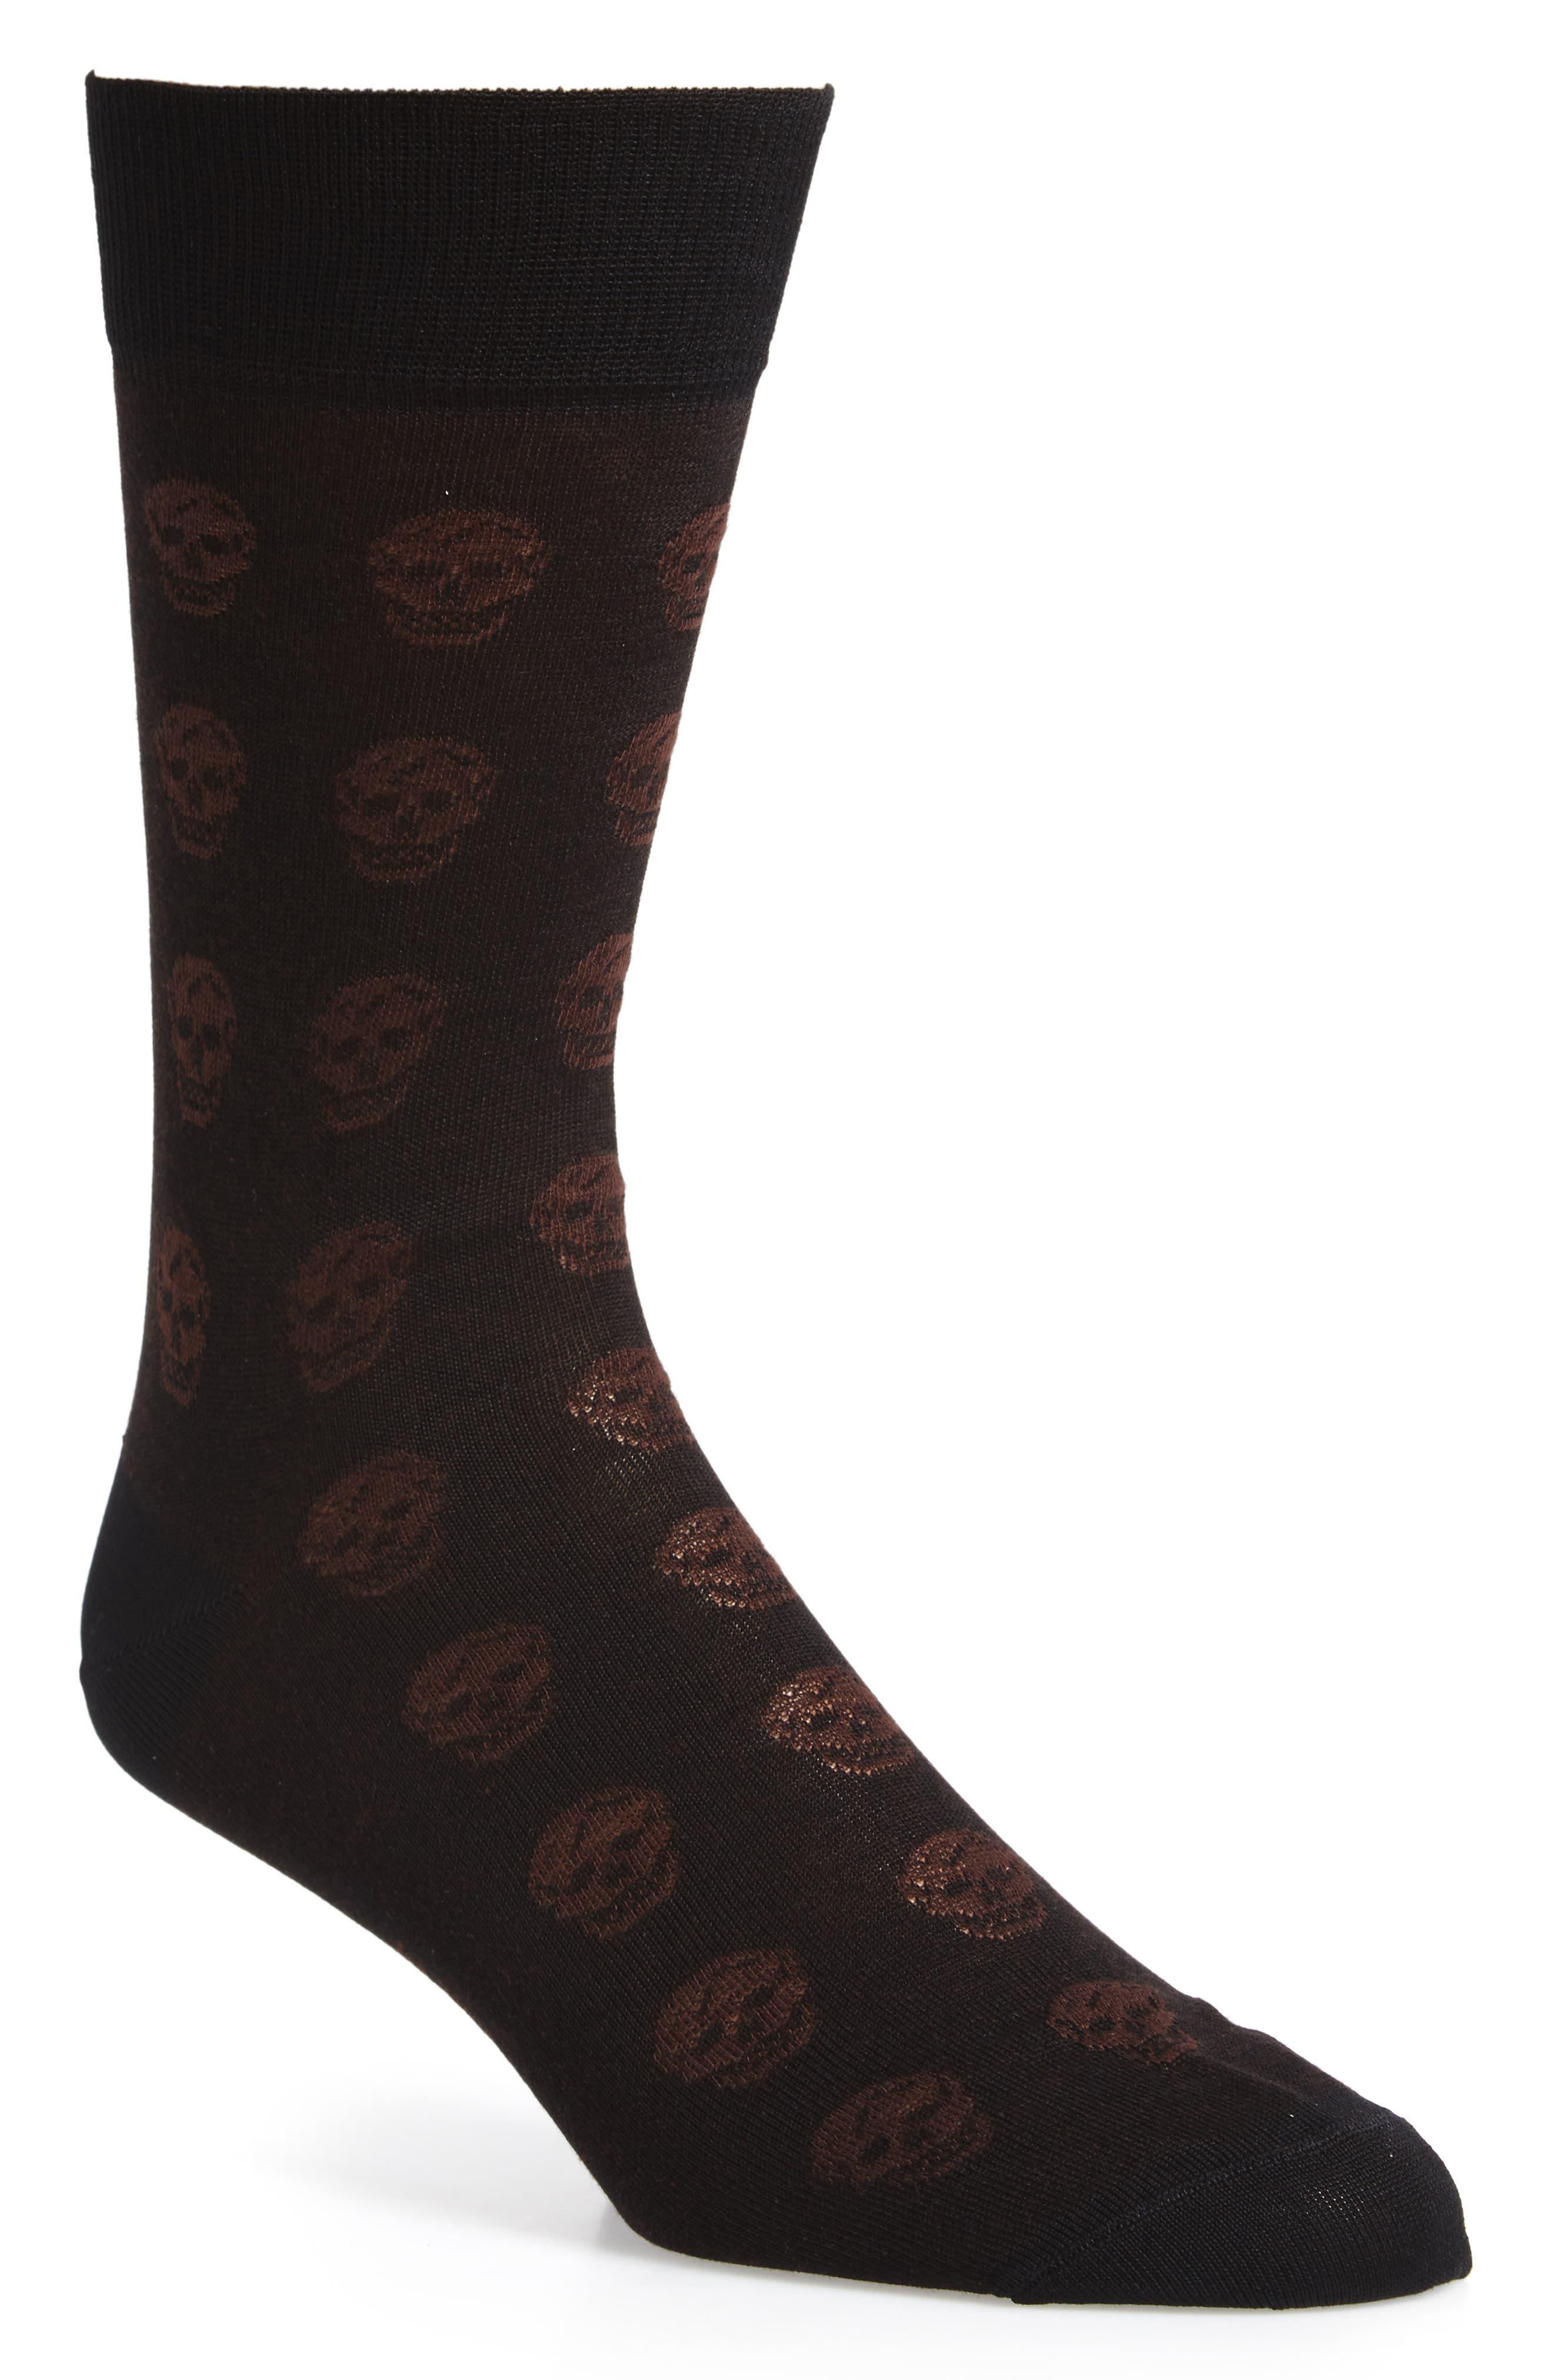 Skull Socks,                         Main,                         color, Black/ Beige